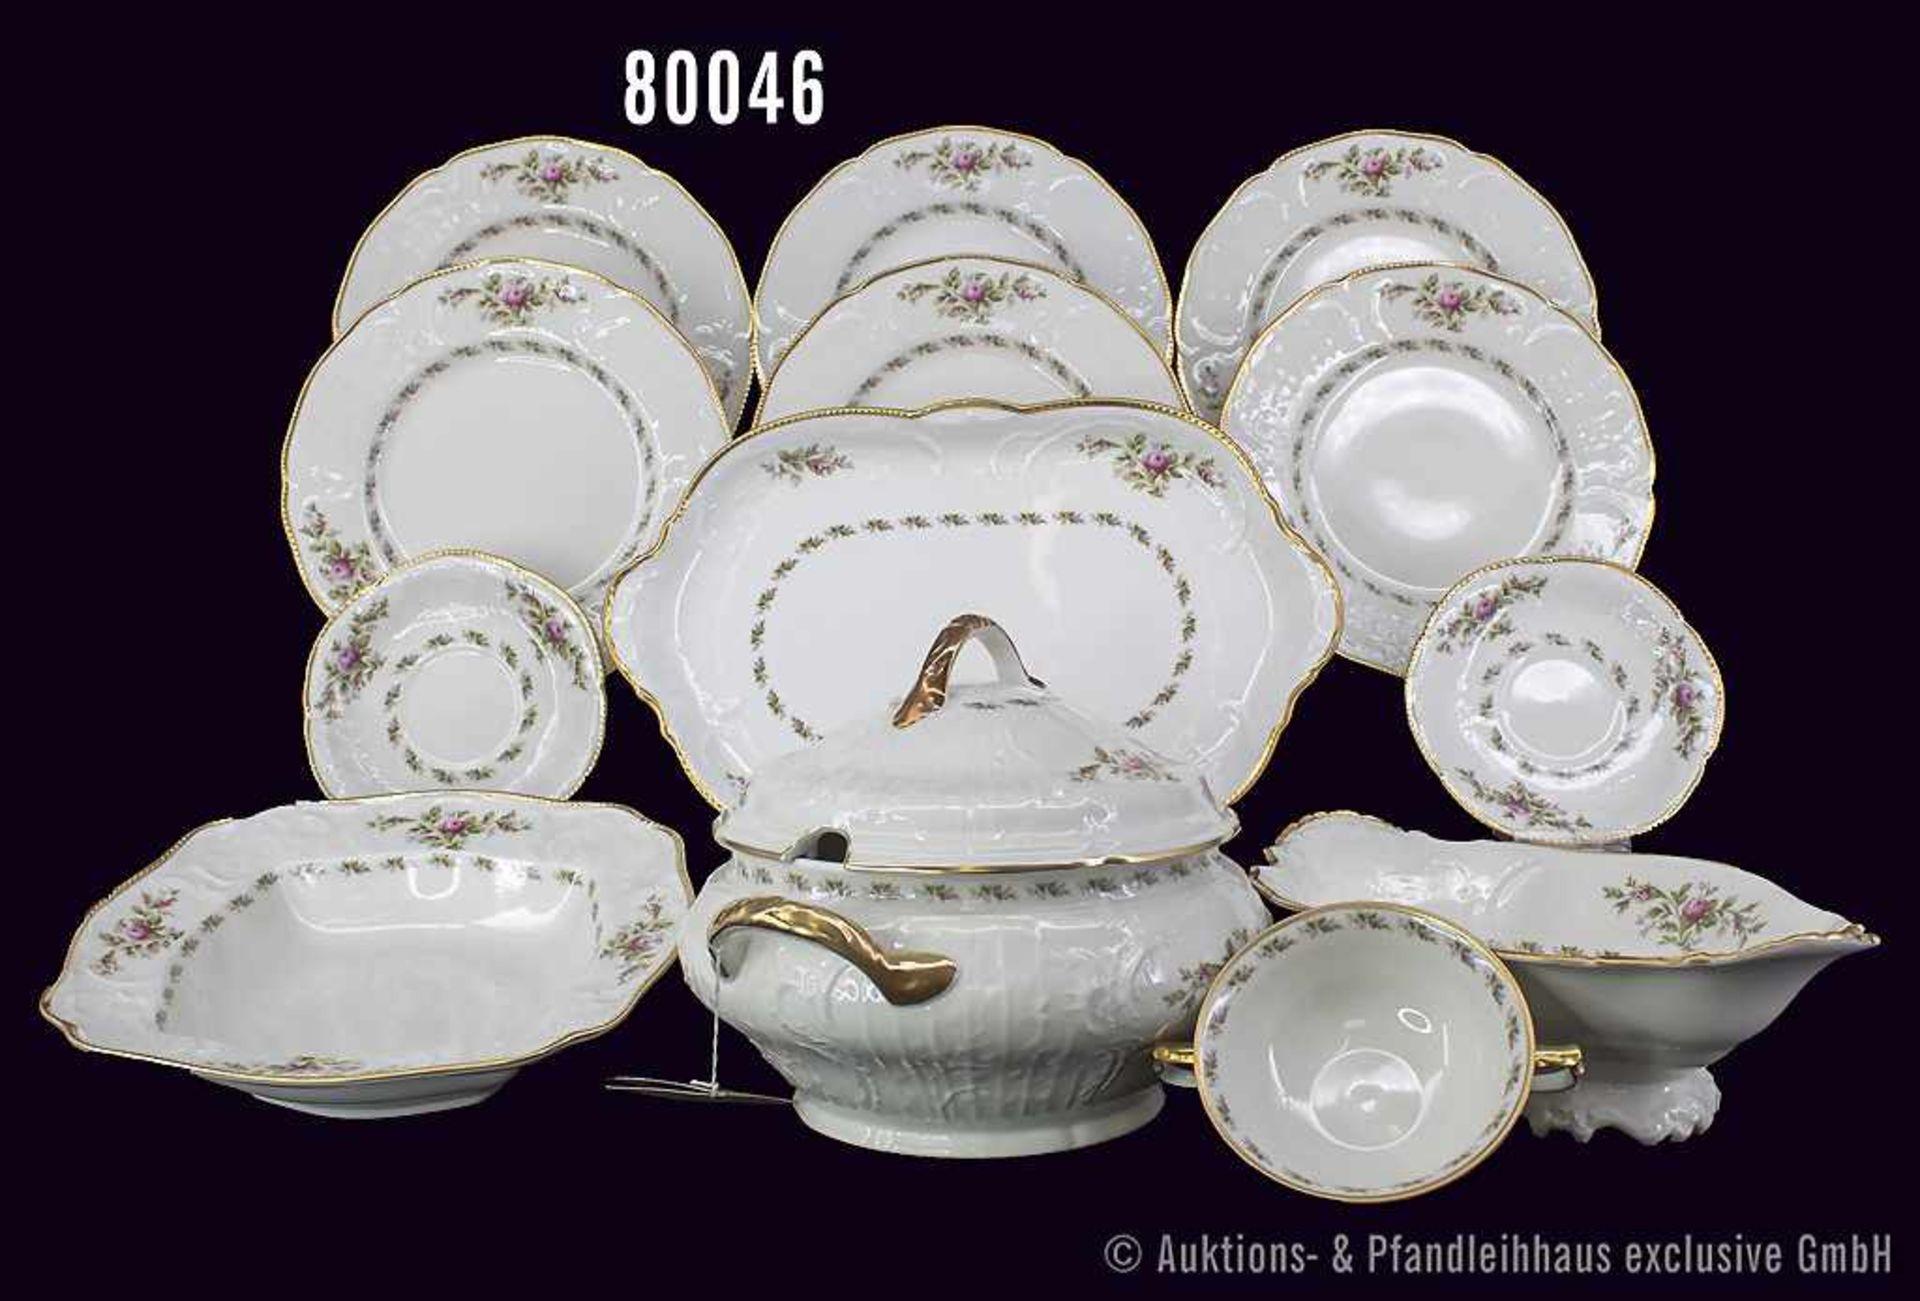 Konv. Rosenthal Porzellan, 22 Teile, Rosenthal Classic, Serie Sanssouci elfenbein, Dekor Moosrose,